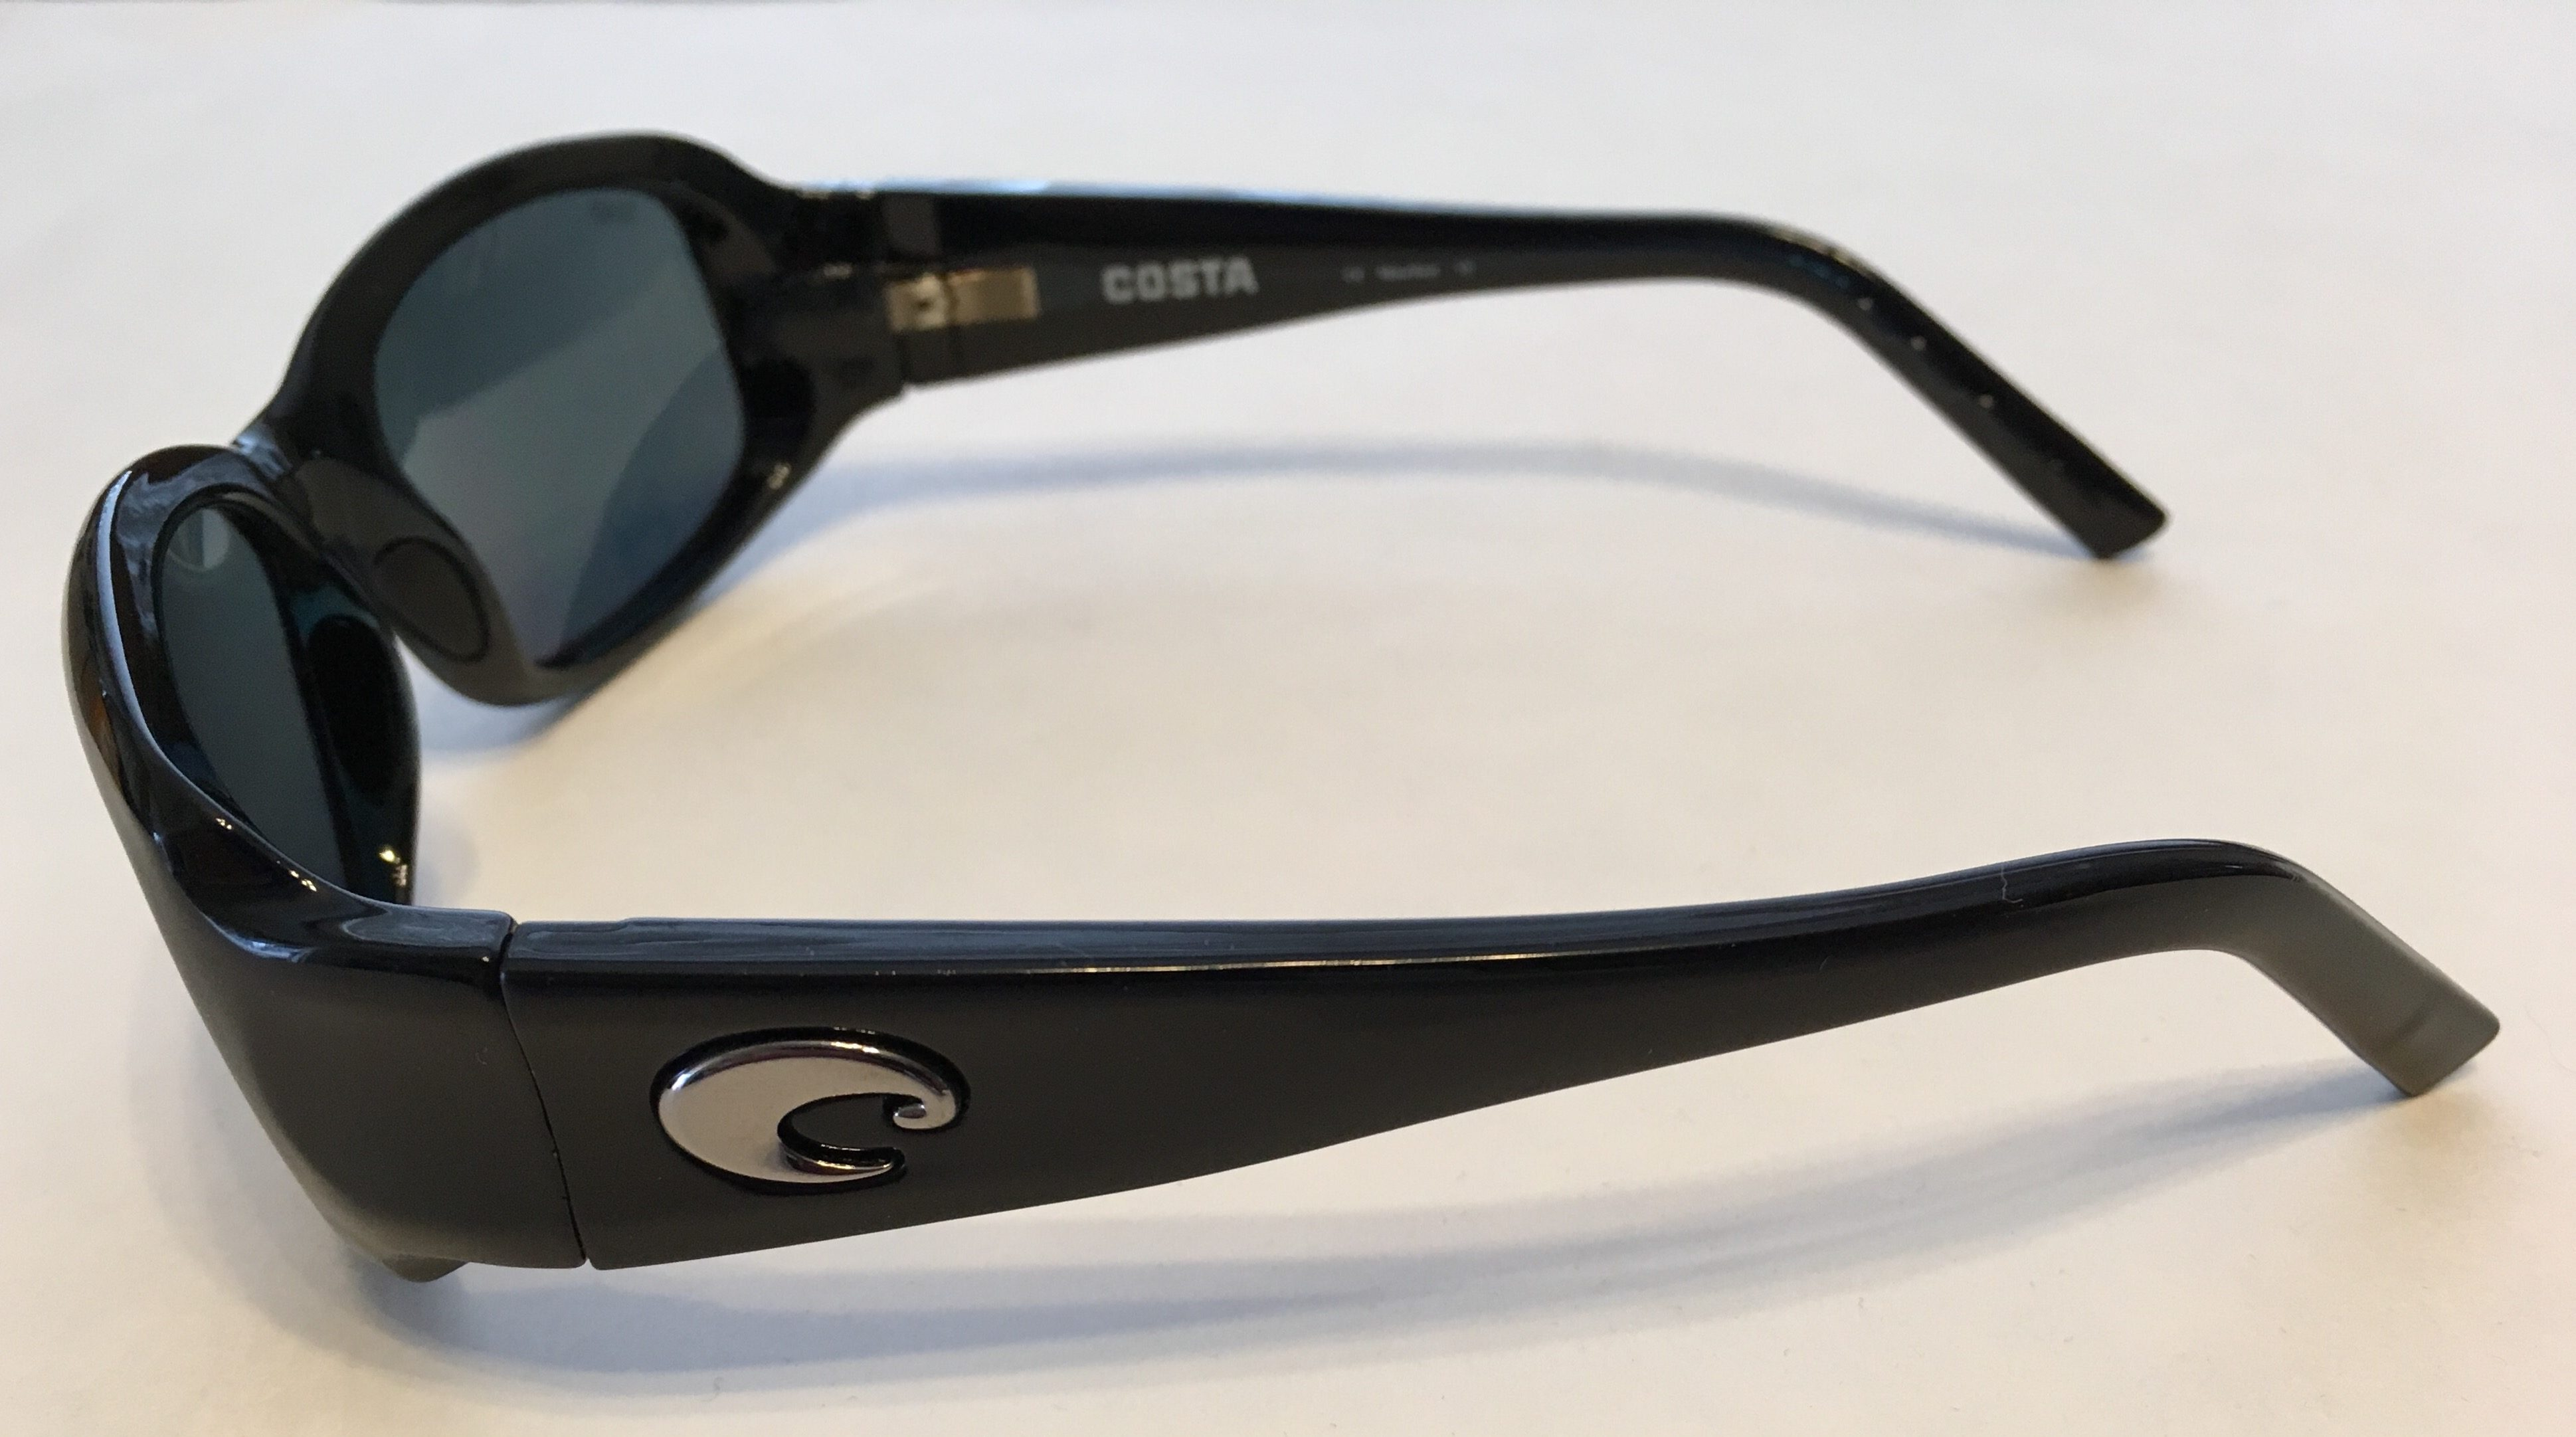 Costa Vela Sunglasses  new costa del mar vela sunglasses black frame polarized gray